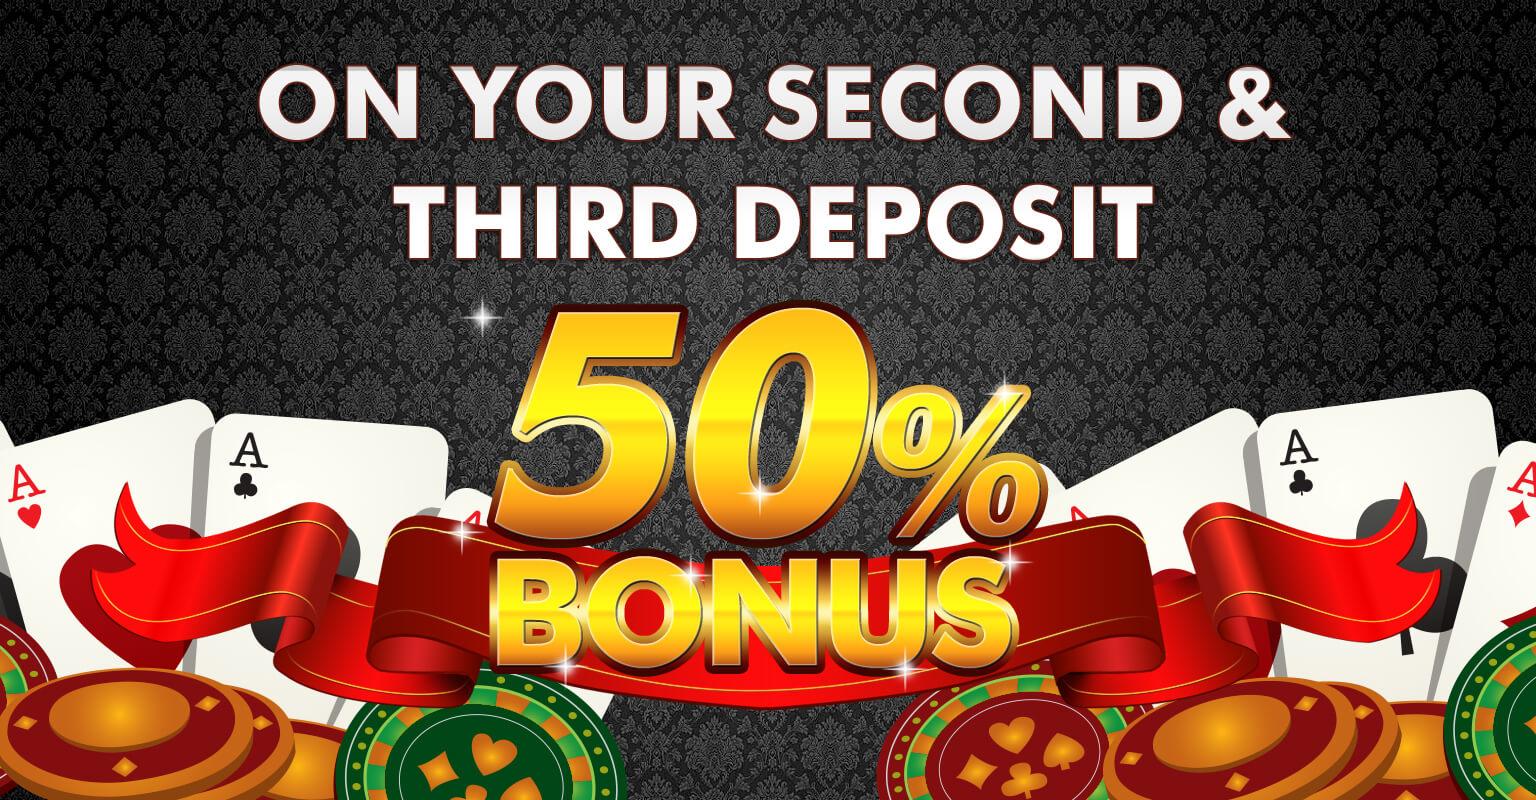 50% deposit bonus on your 2nd and 3rd deposit!